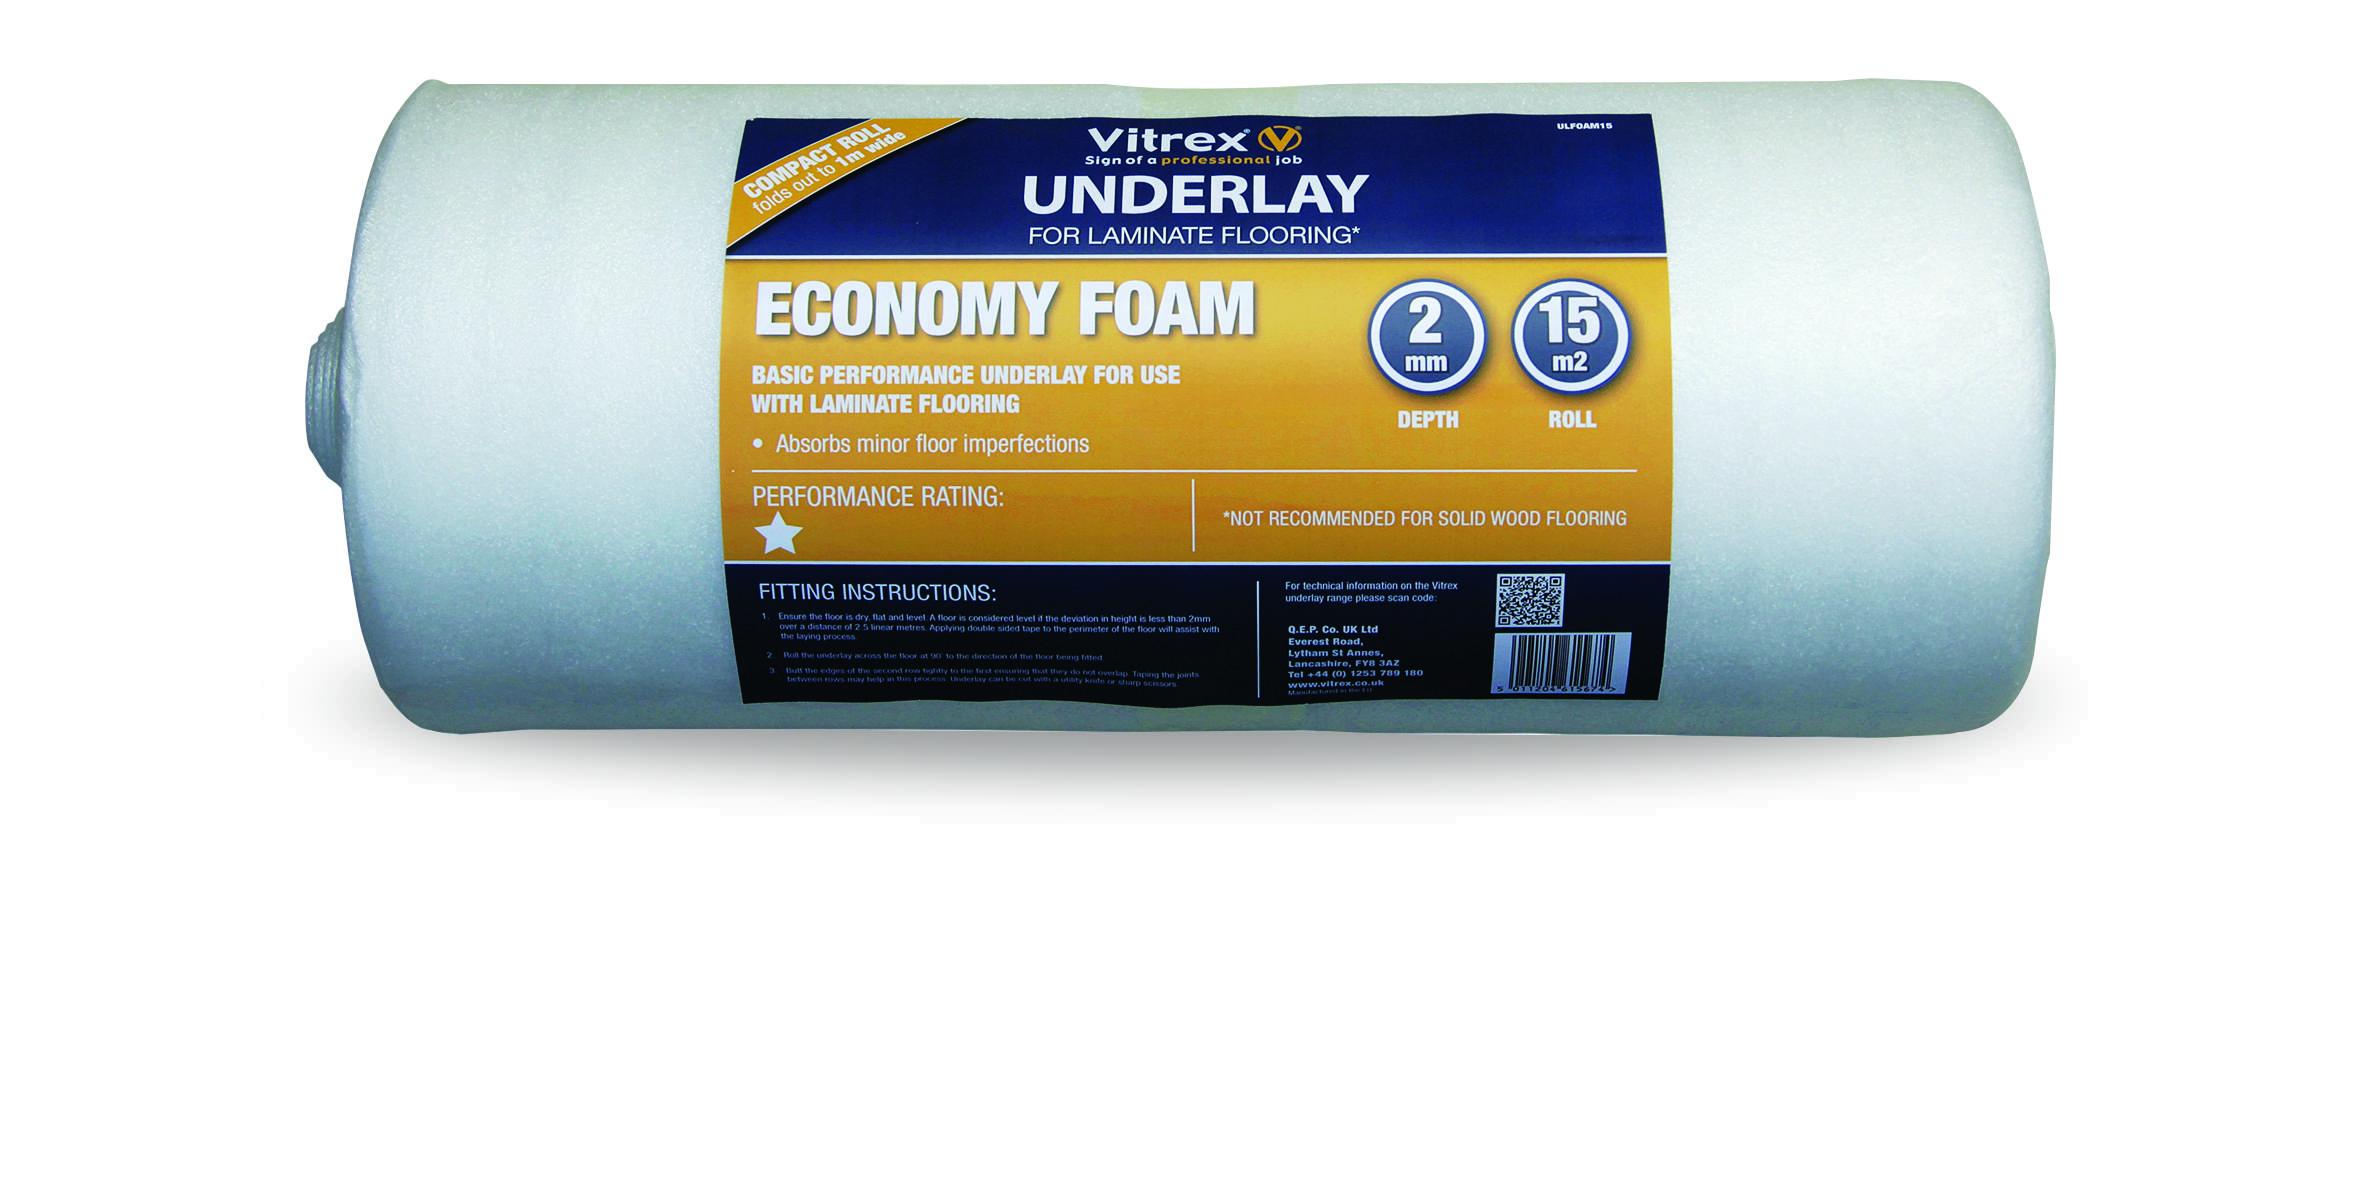 Economy Foam Underlay 15m2 Roll